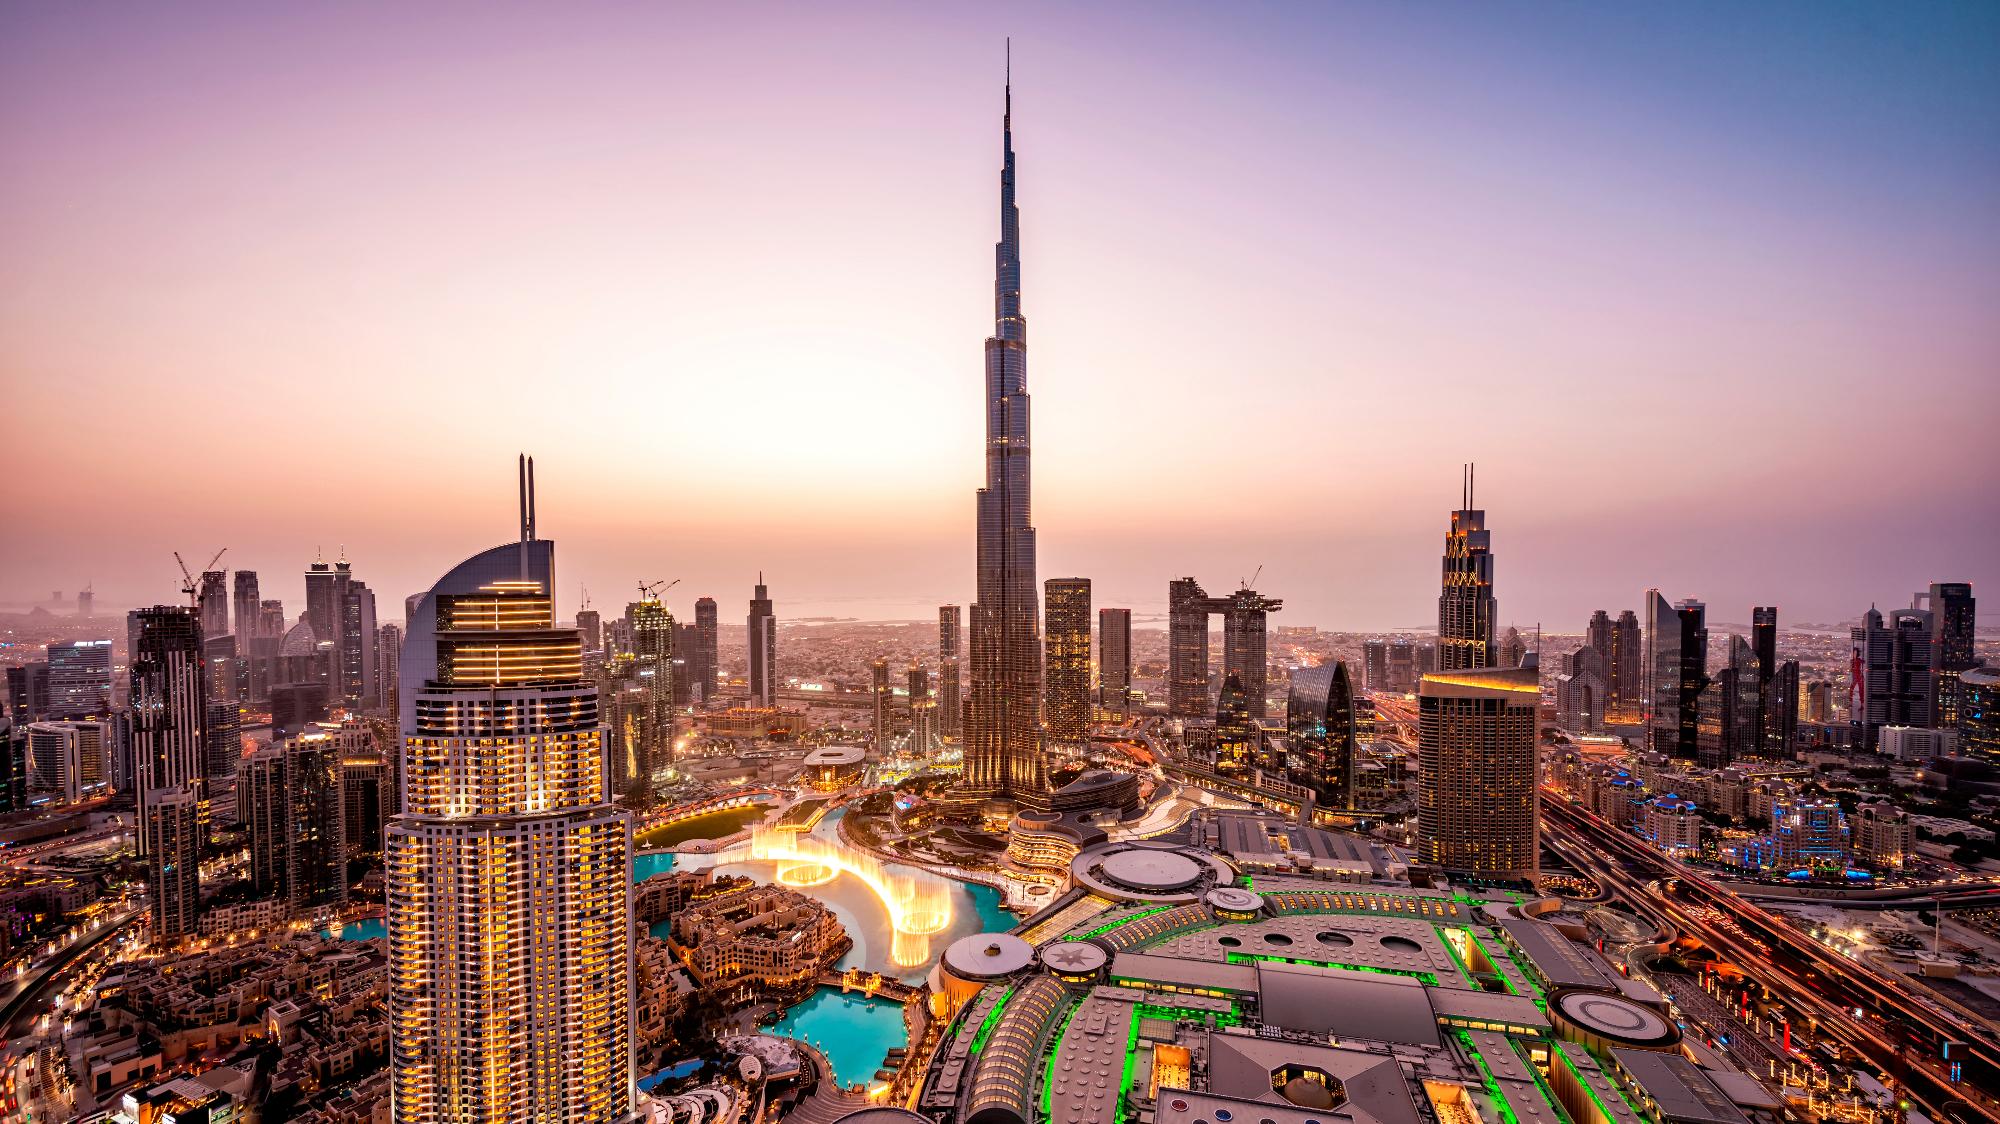 15th CAD/CAM Digital Dentistry & 12th Dental Facial Cosmetic (CAPP Dental ConfExpo 2020 Dubai)